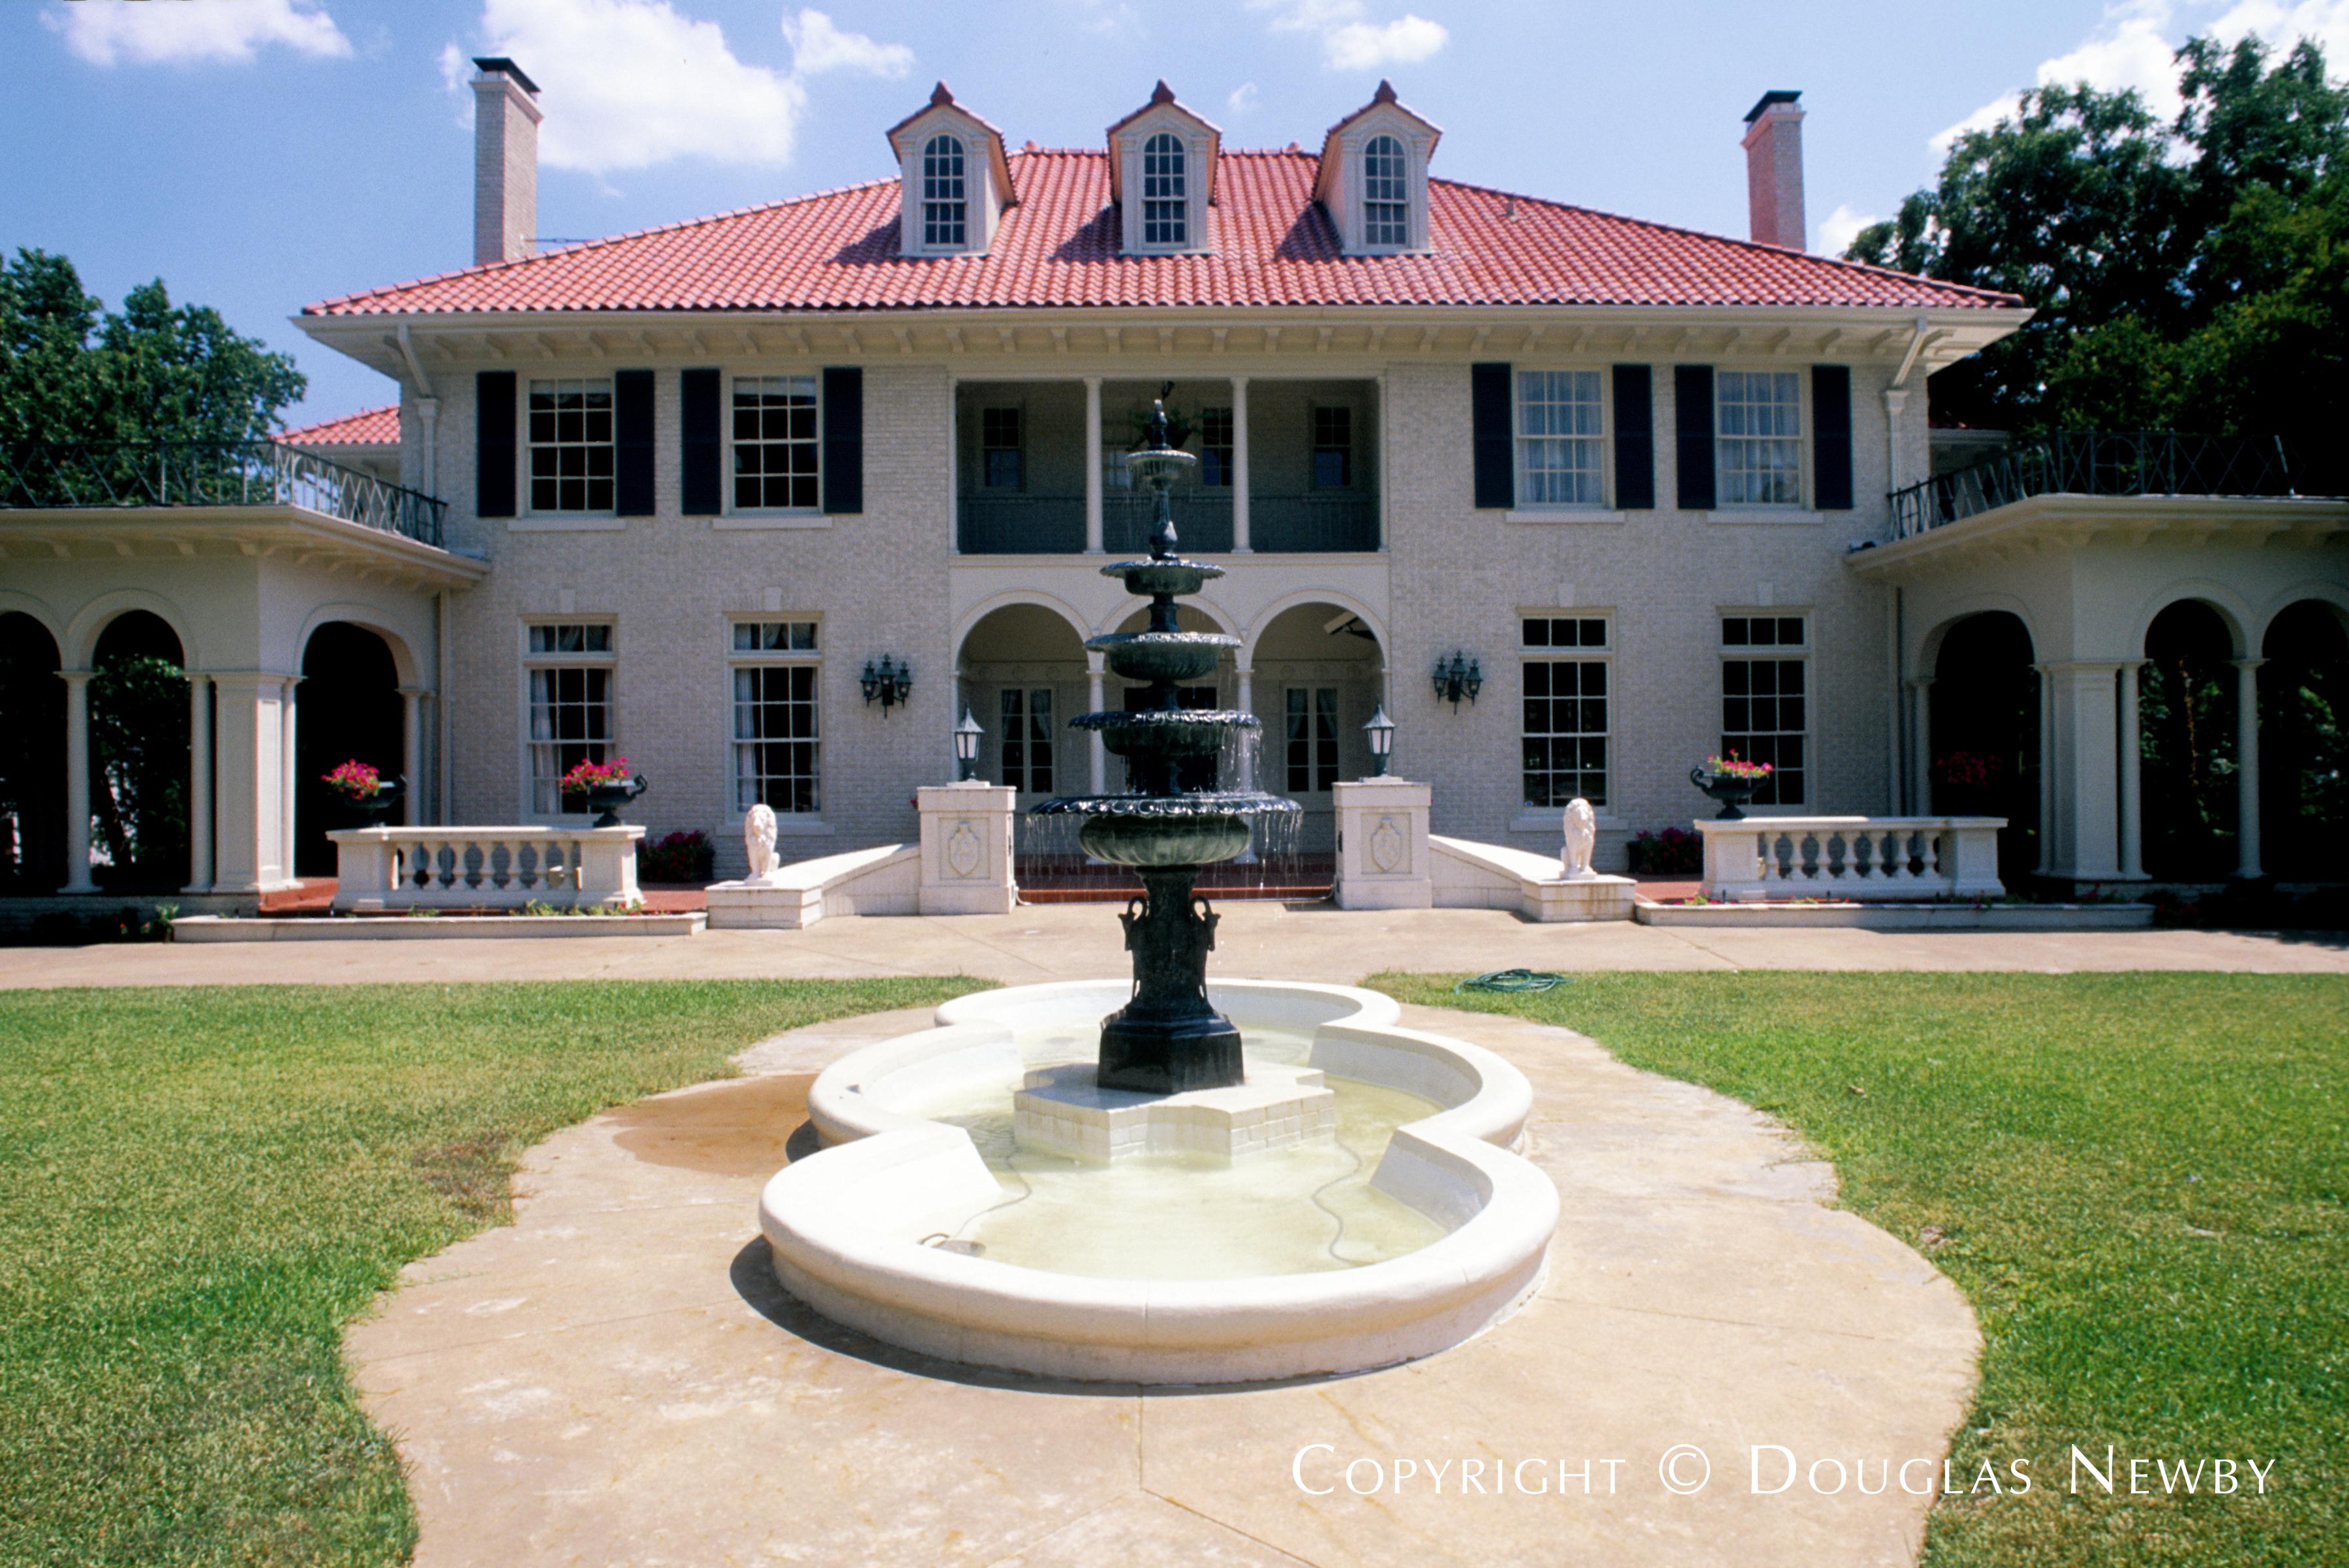 Kessler Park Real Estate